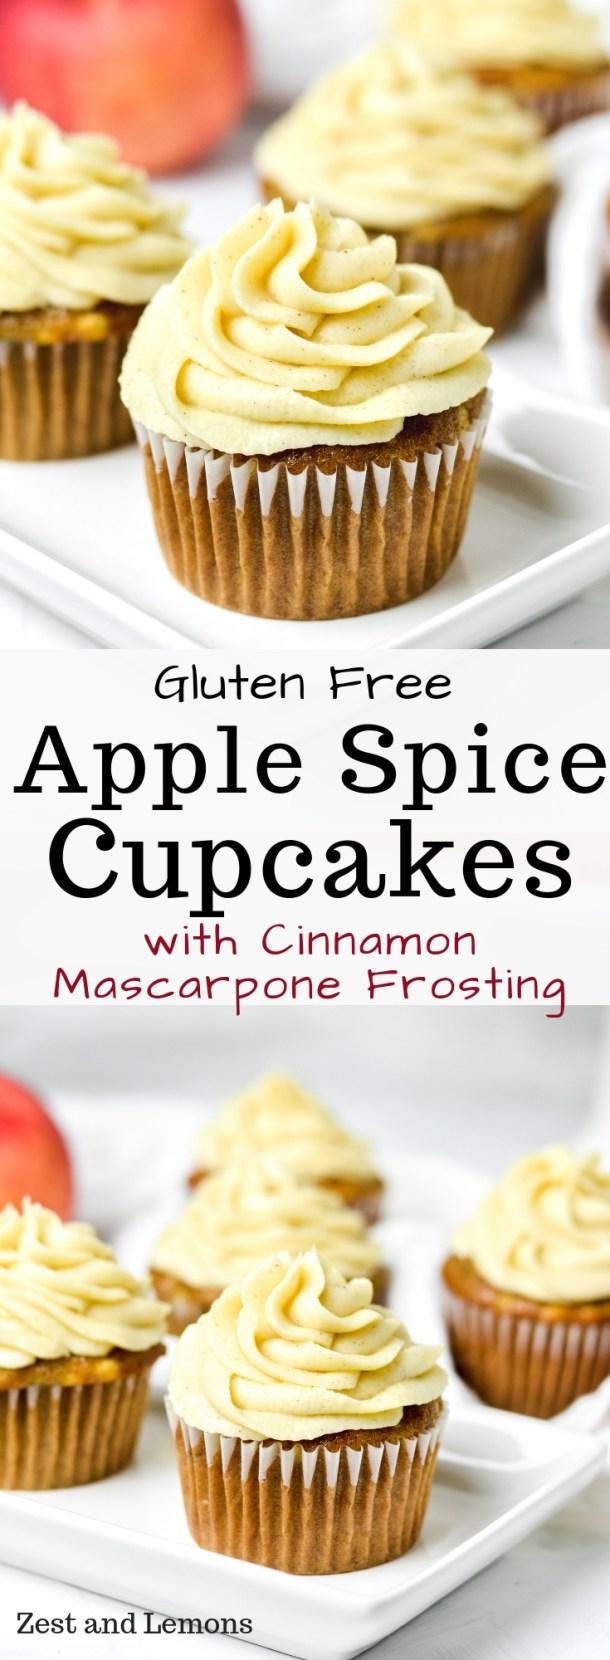 Gluten free apple spice cupcakes with cinnamon mascarpone frosting - Zest and Lemons #glutenfree #glutenfreecupcakes #applecake #glutenfreedesserts